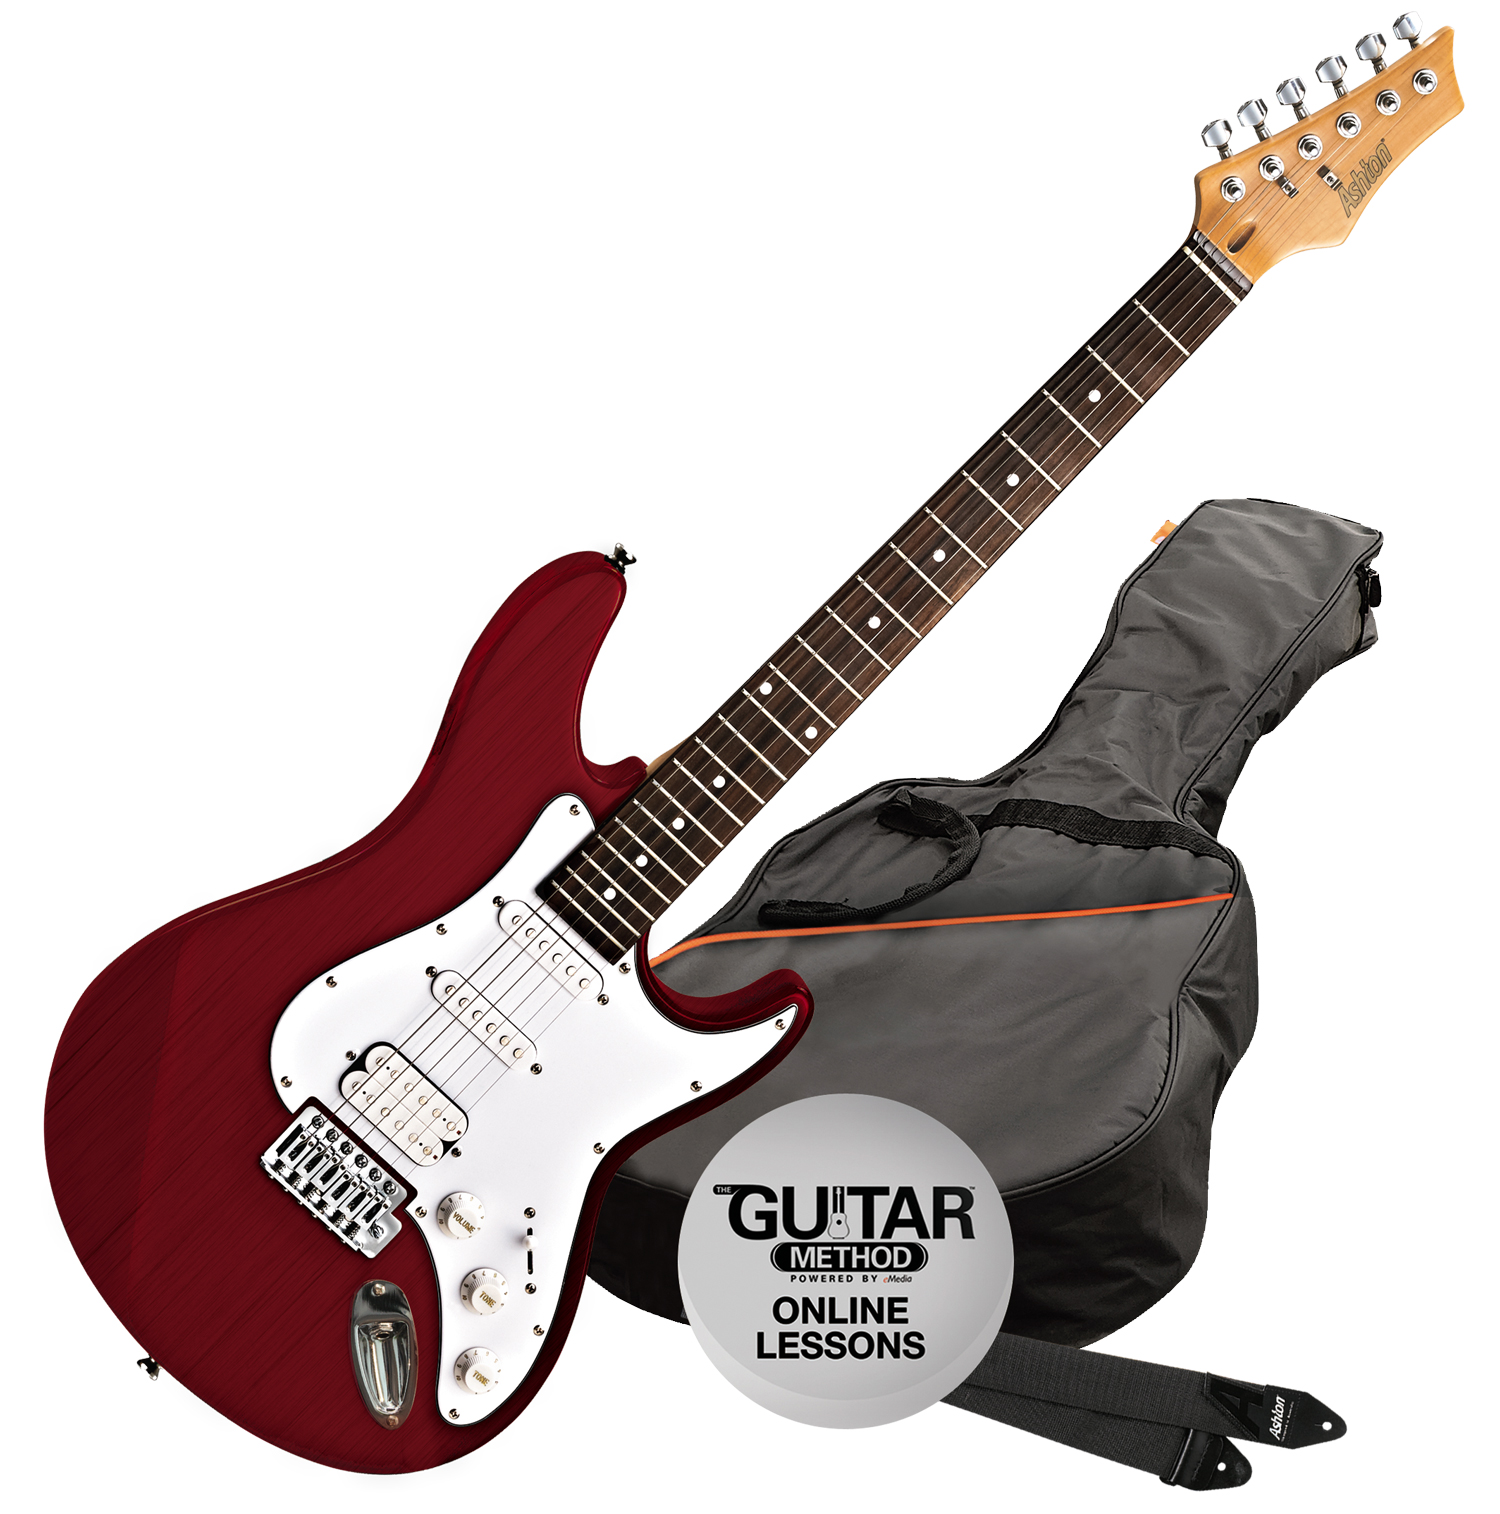 musicworks guitars electric guitars electric guitars ashton electric guitar pack. Black Bedroom Furniture Sets. Home Design Ideas